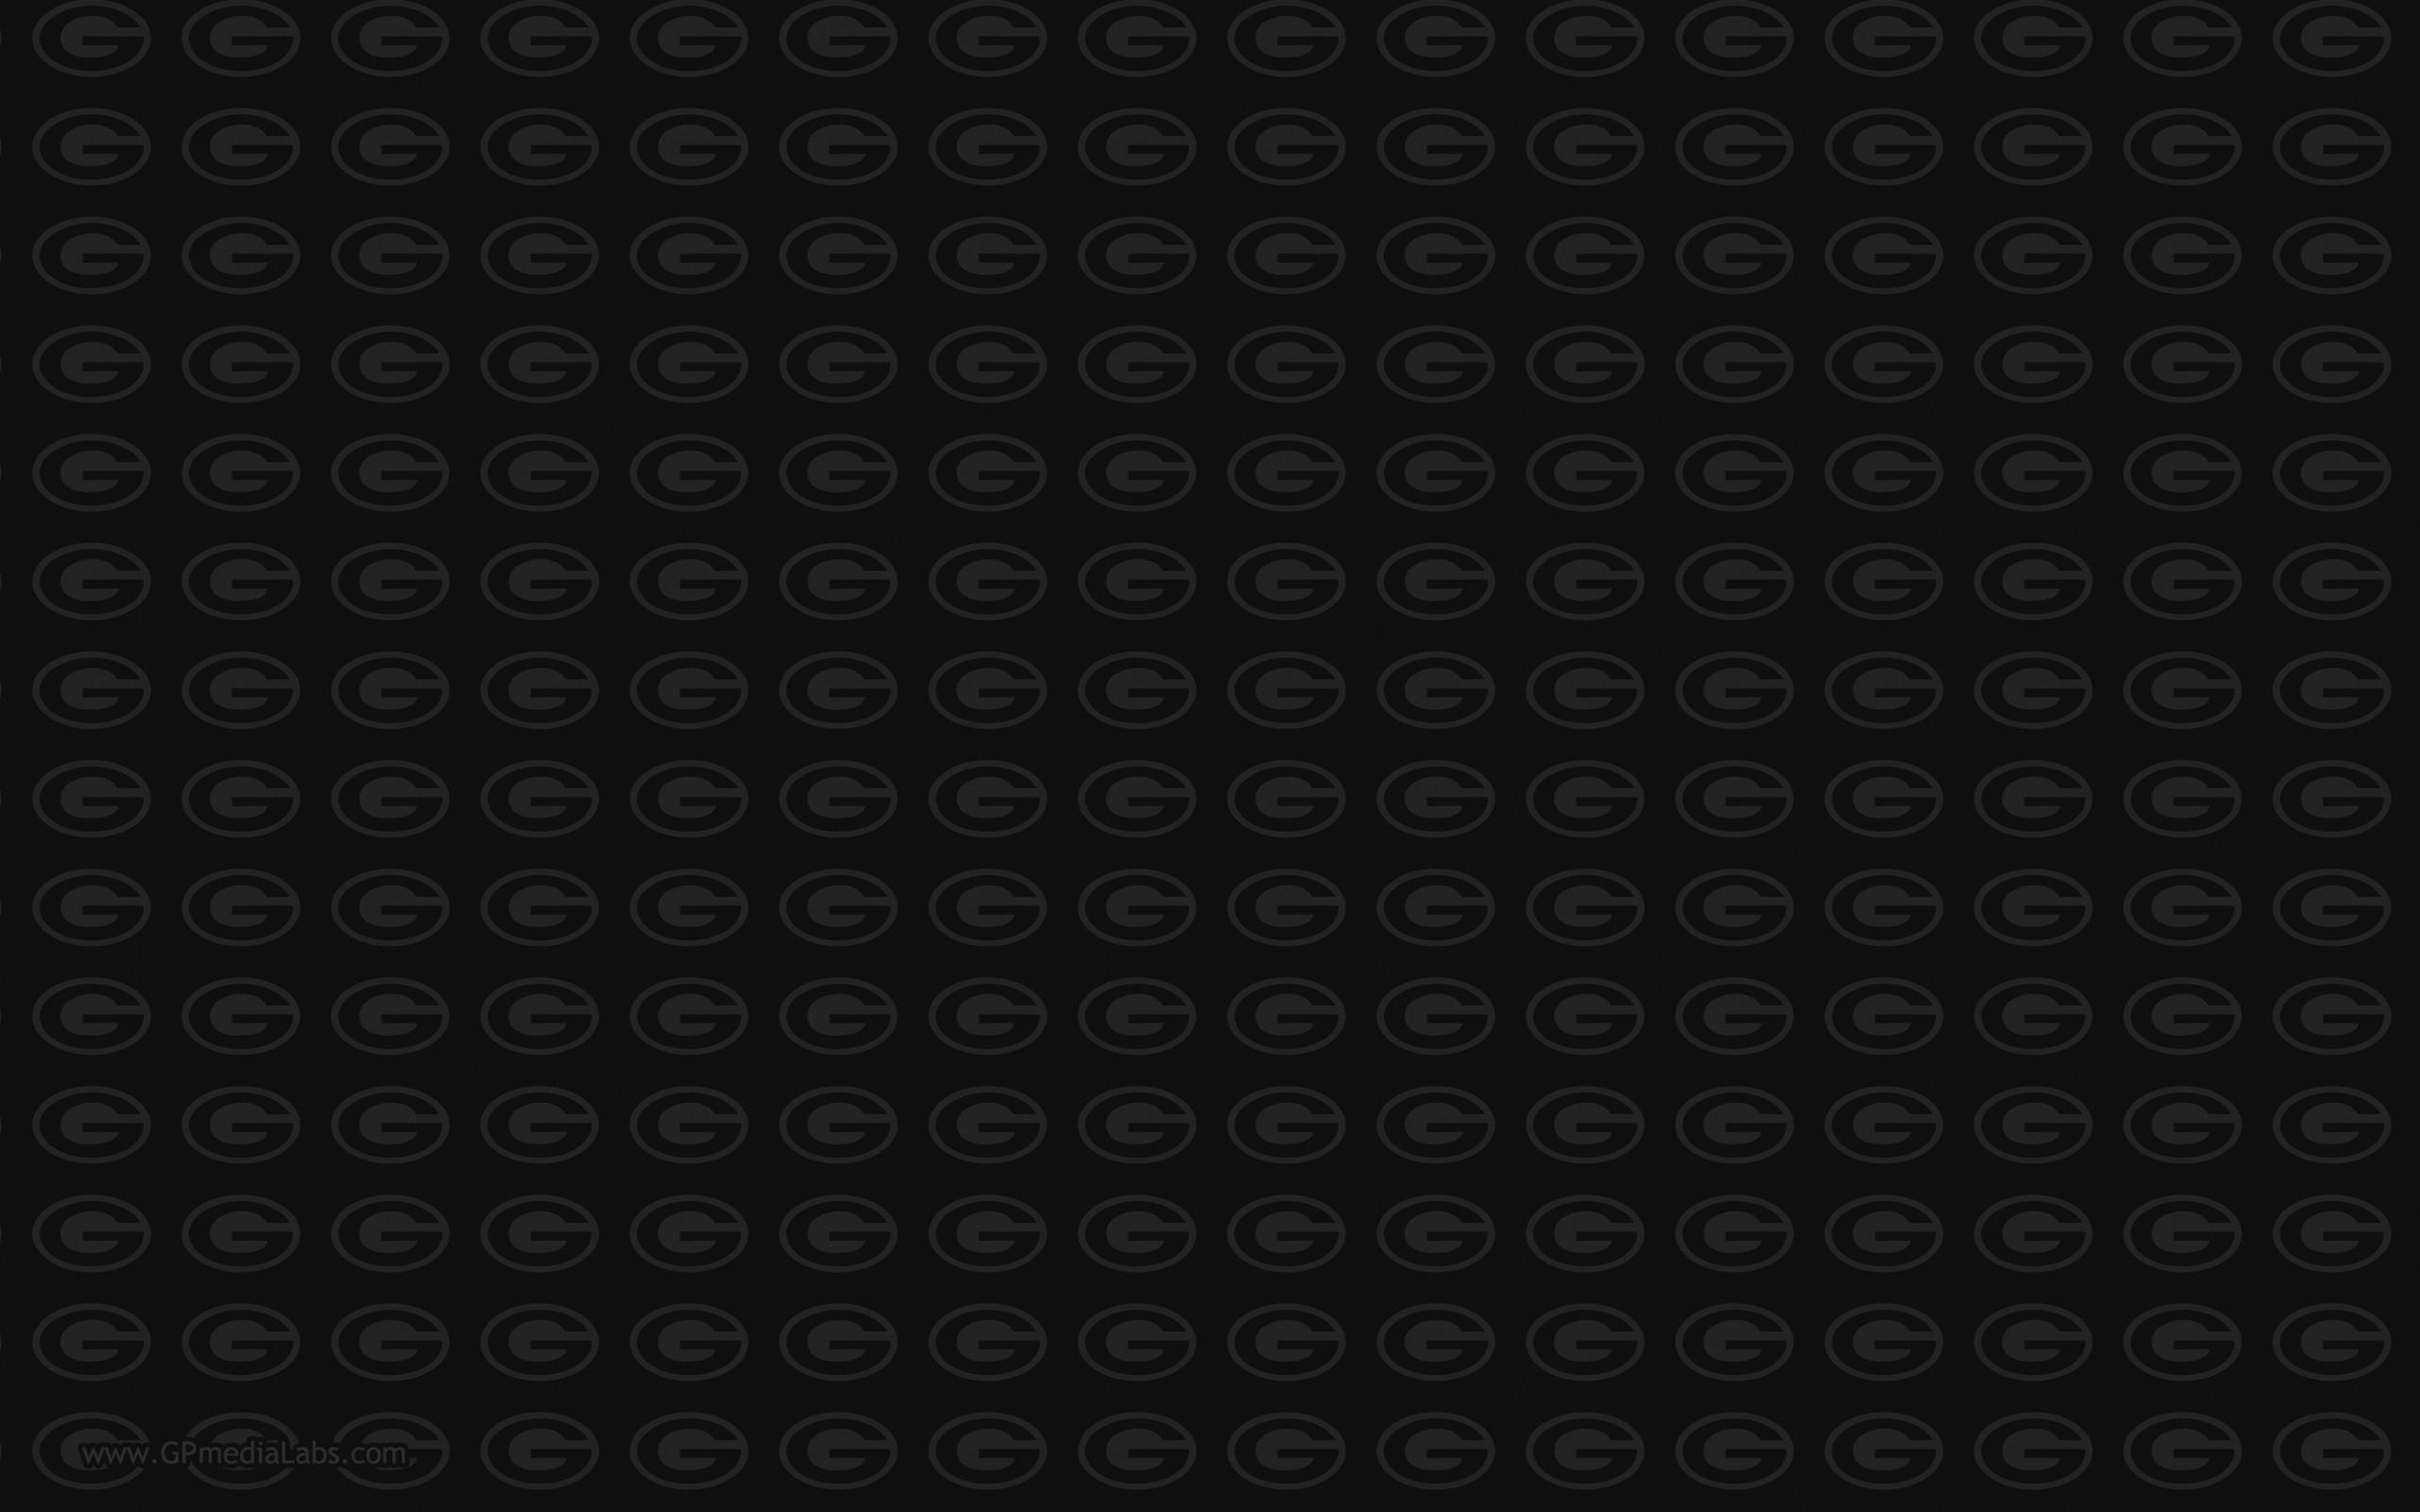 Green Bay Packers Wallpaper – Green Bay Packers Logo Pattern Wallpaper